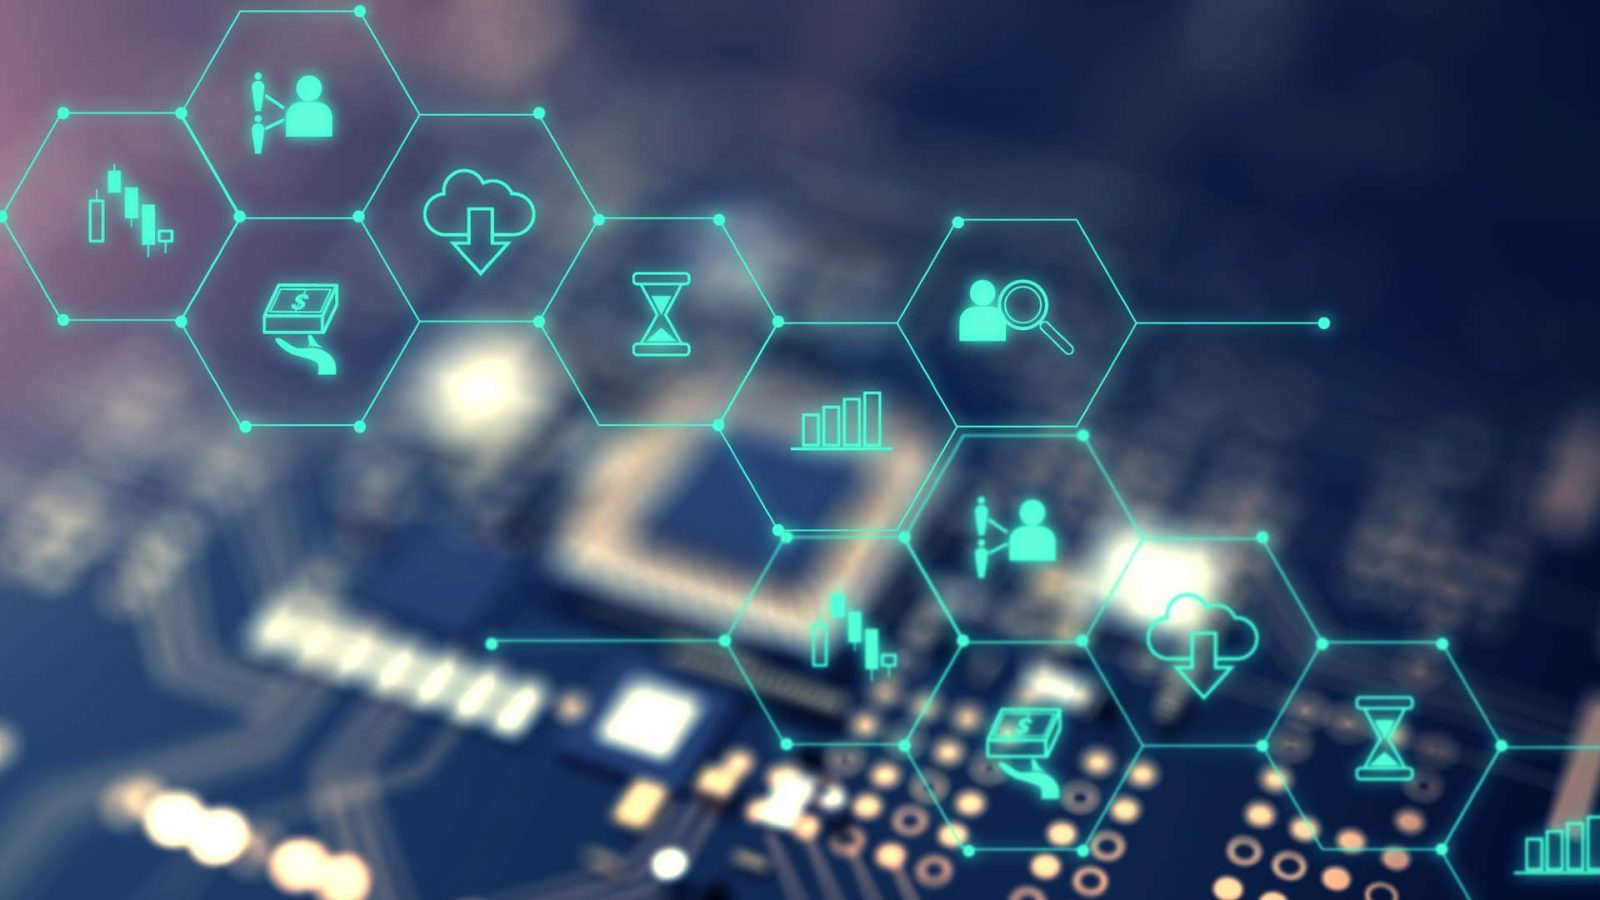 stratis - Buy All the Things! Litecoin (LTC) Ripple (XRP) Iota (MIOTA)